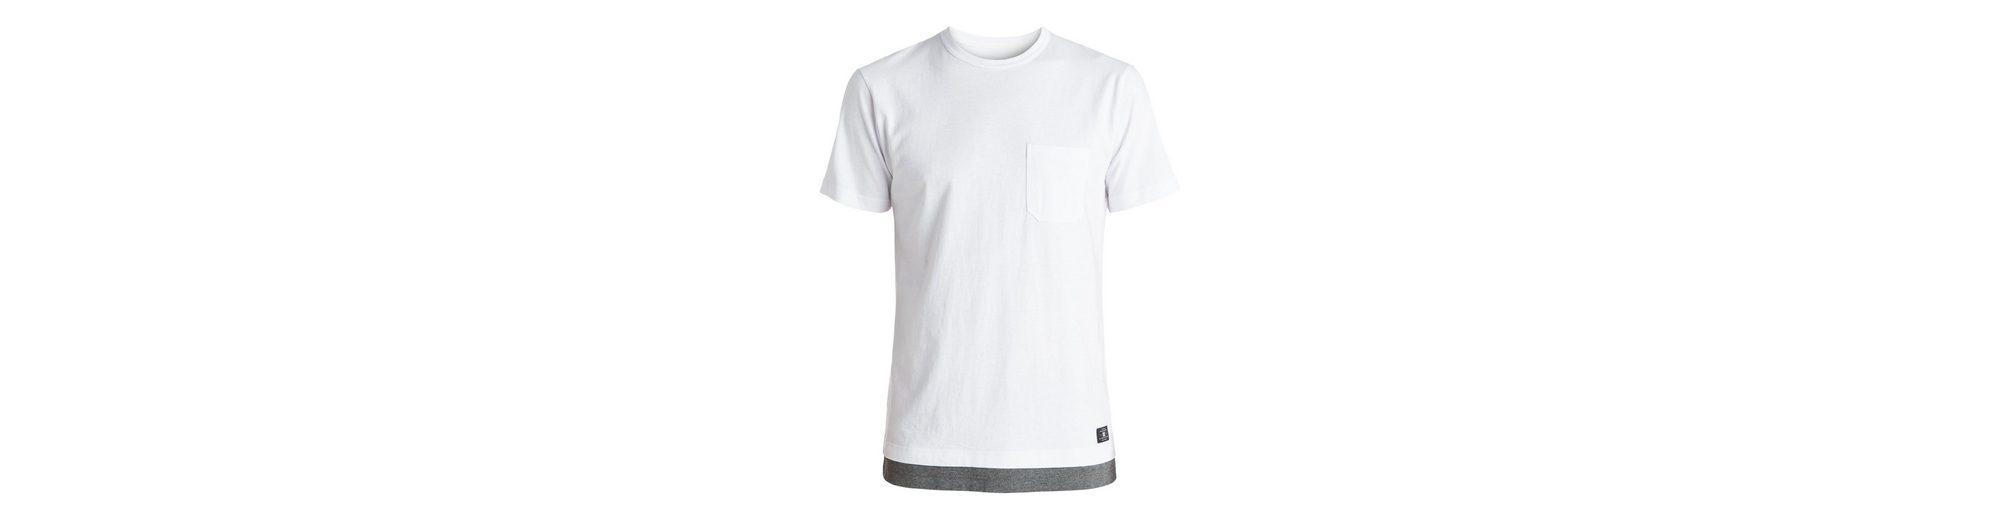 DC Shoes Pocket-T-Shirt Conover - Pocket-T-Shirt Kostengünstige Online qazgDdOF3